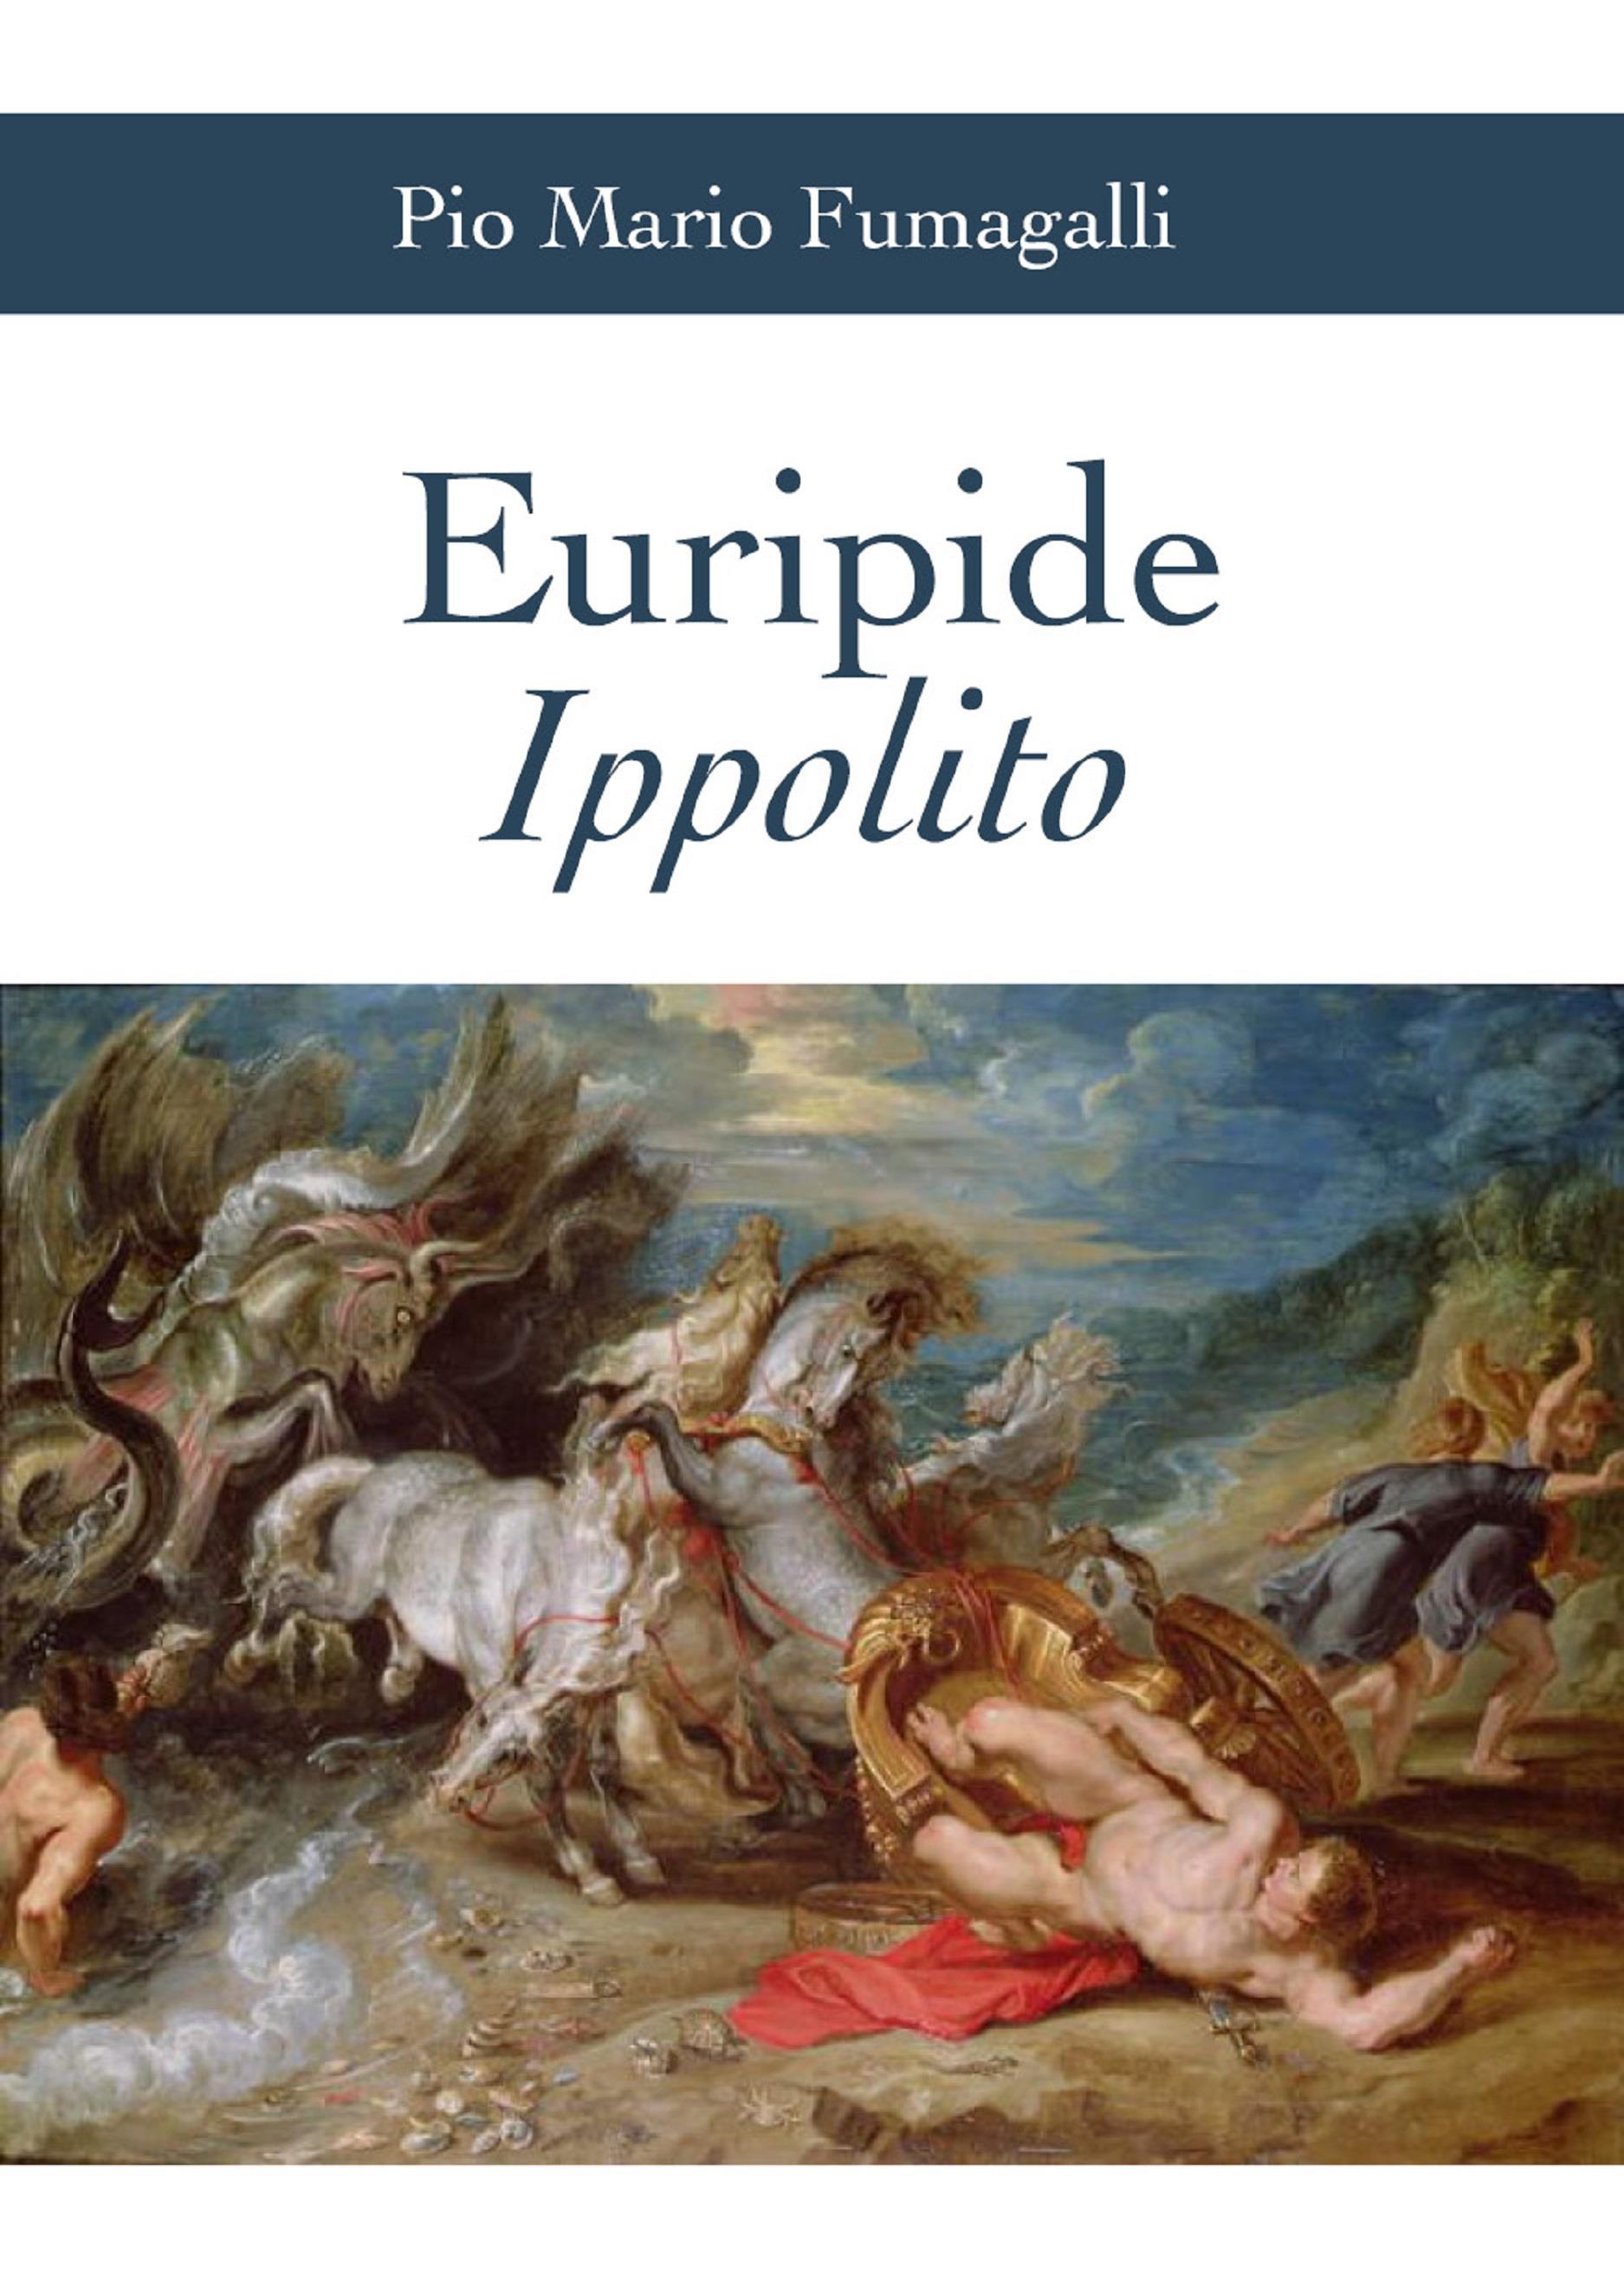 Euripide Ippolito